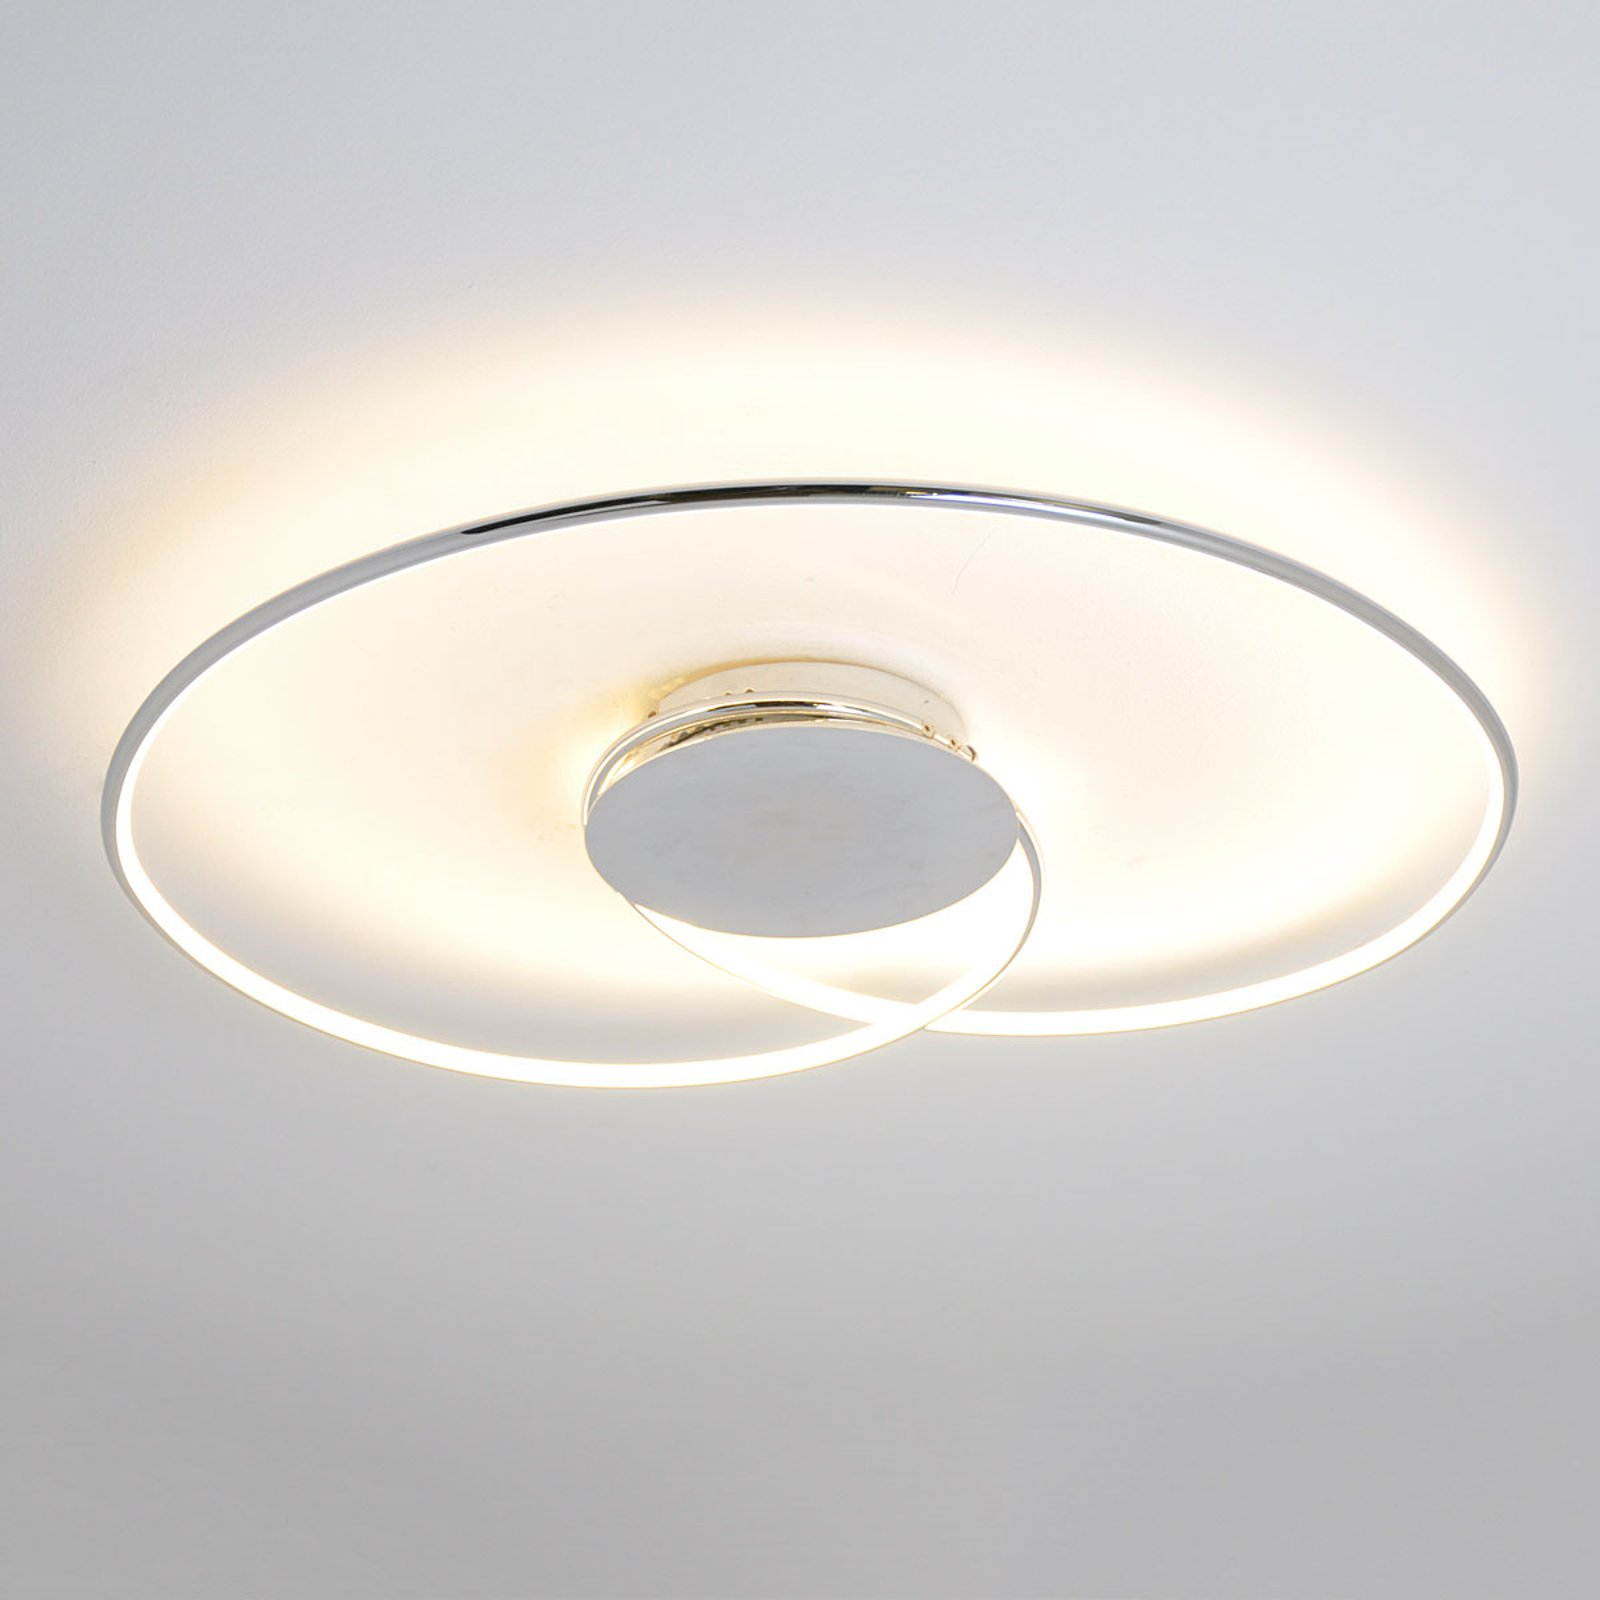 Joline yndig LED-taklampe